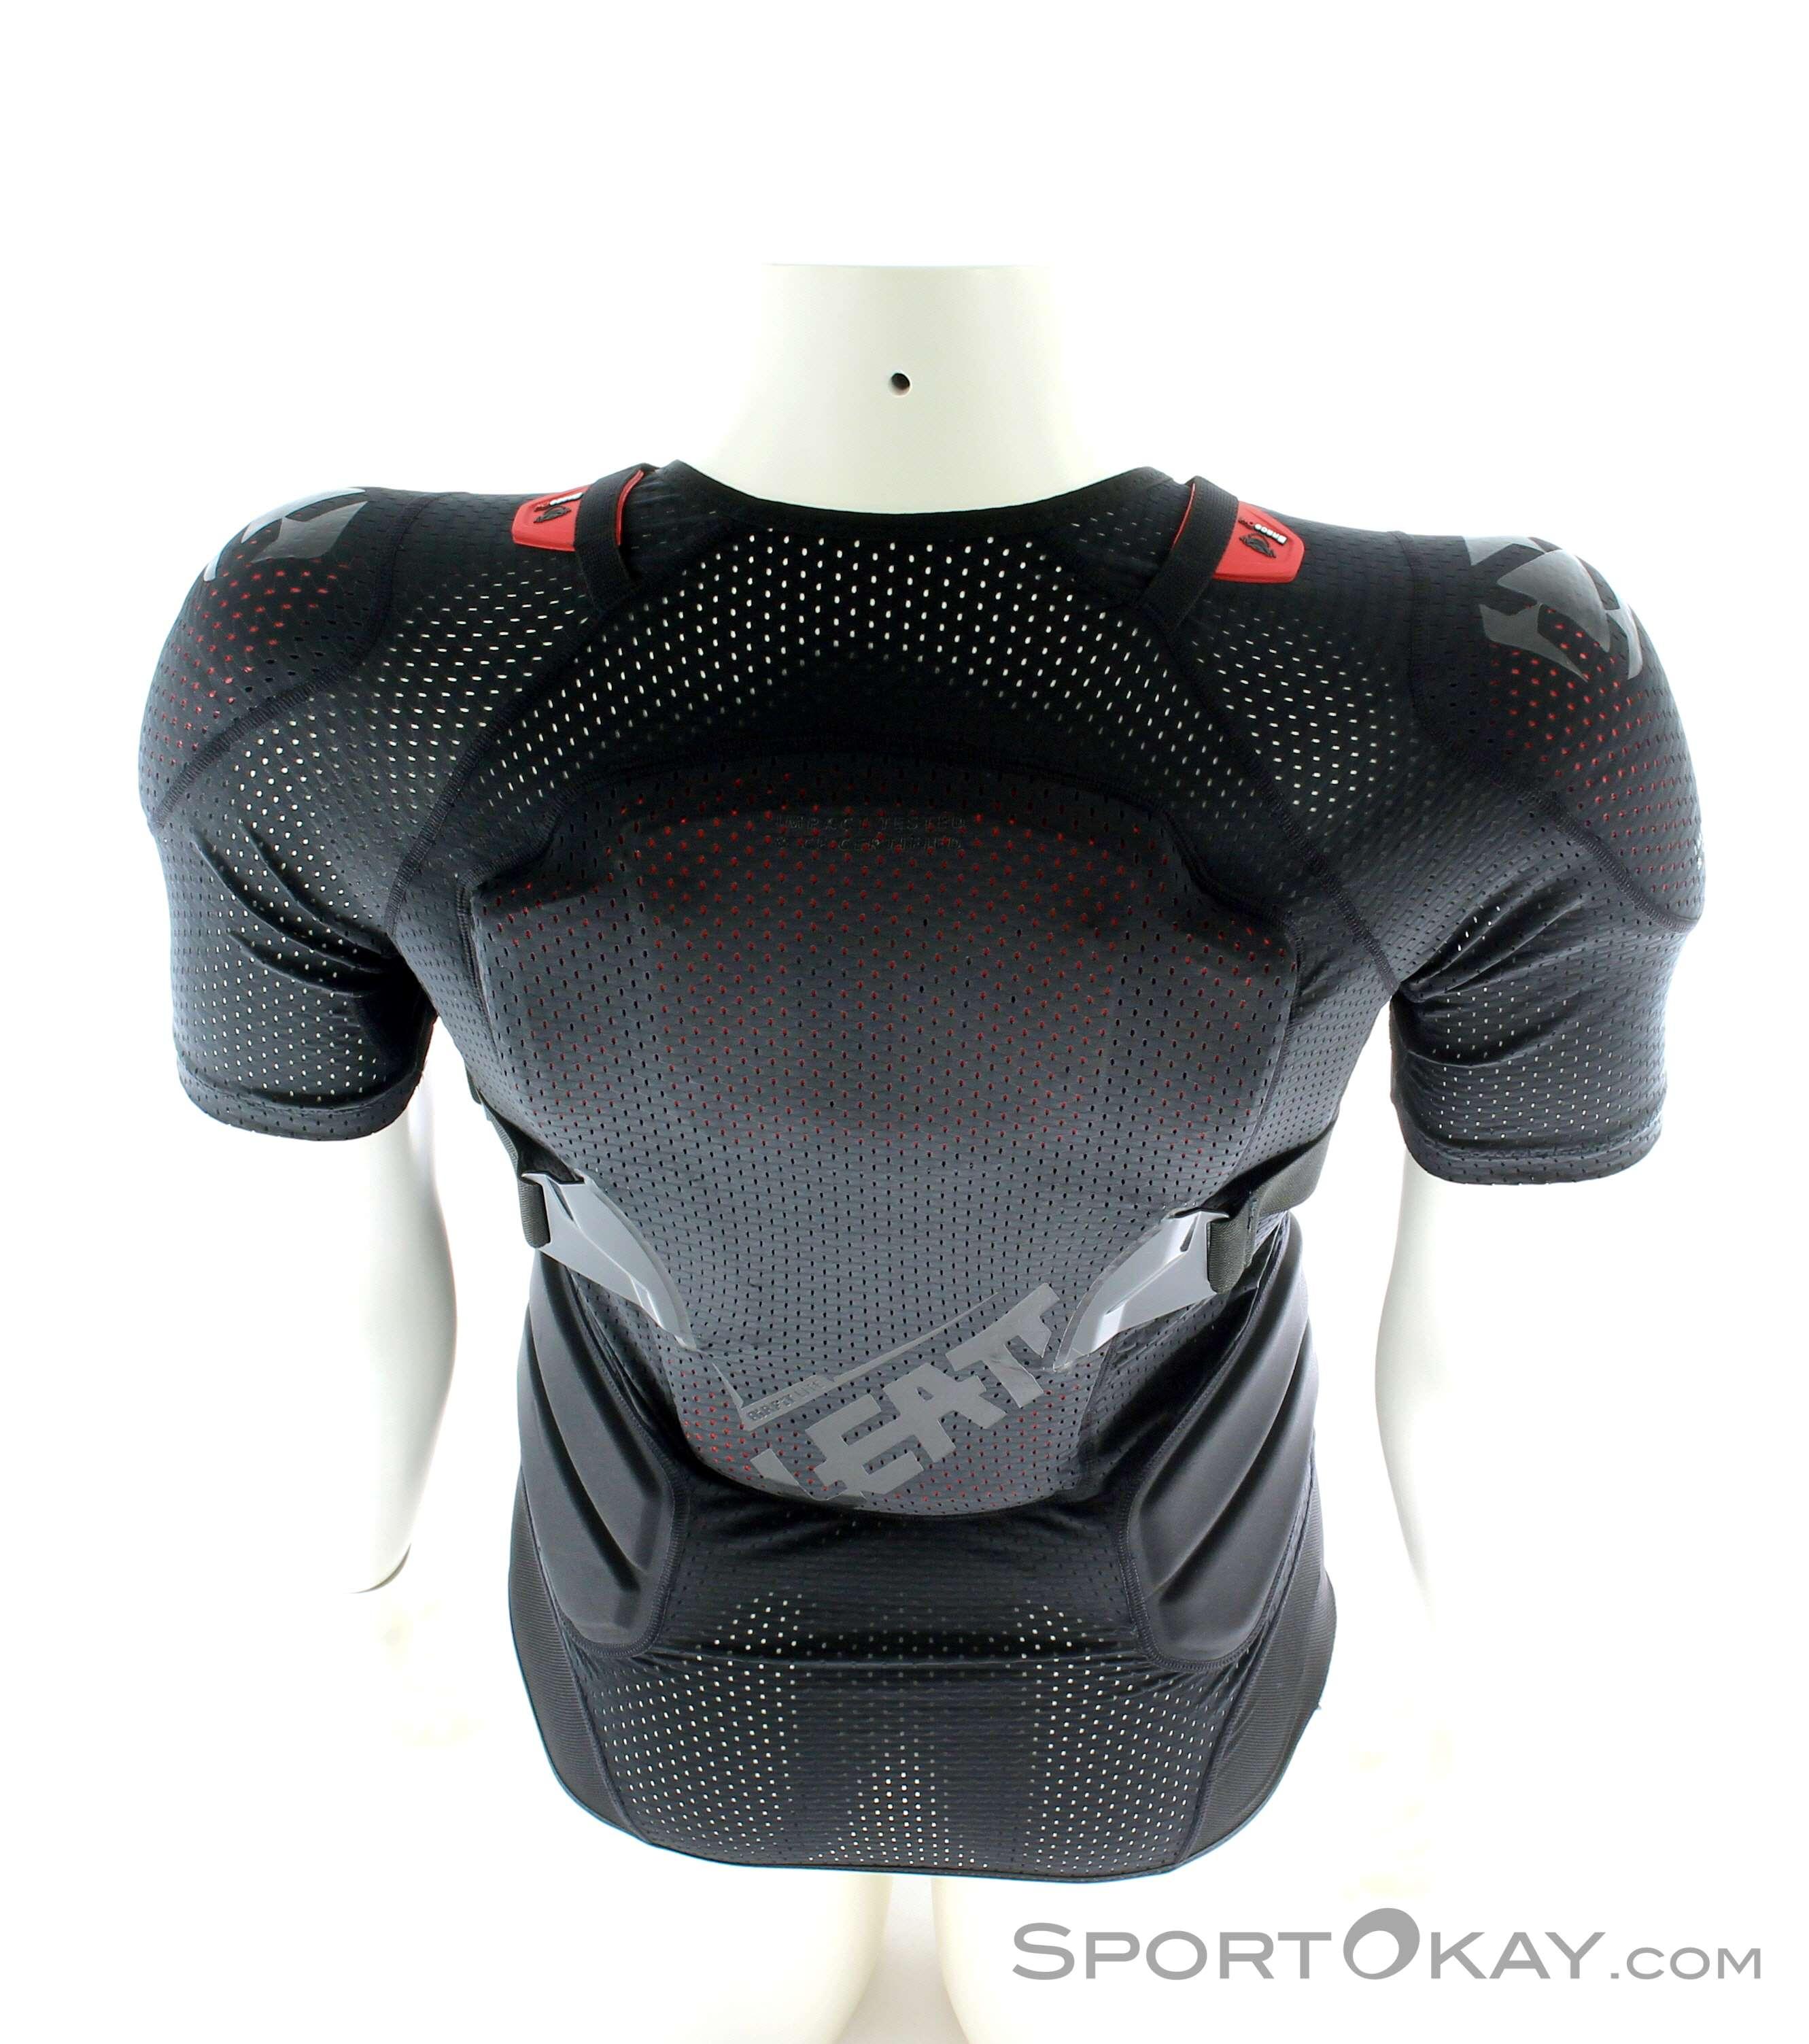 leatt 3df airfit lite nero 2019  Leatt Leatt Body Tee 3DF AirFit Lite Maglia Protettiva